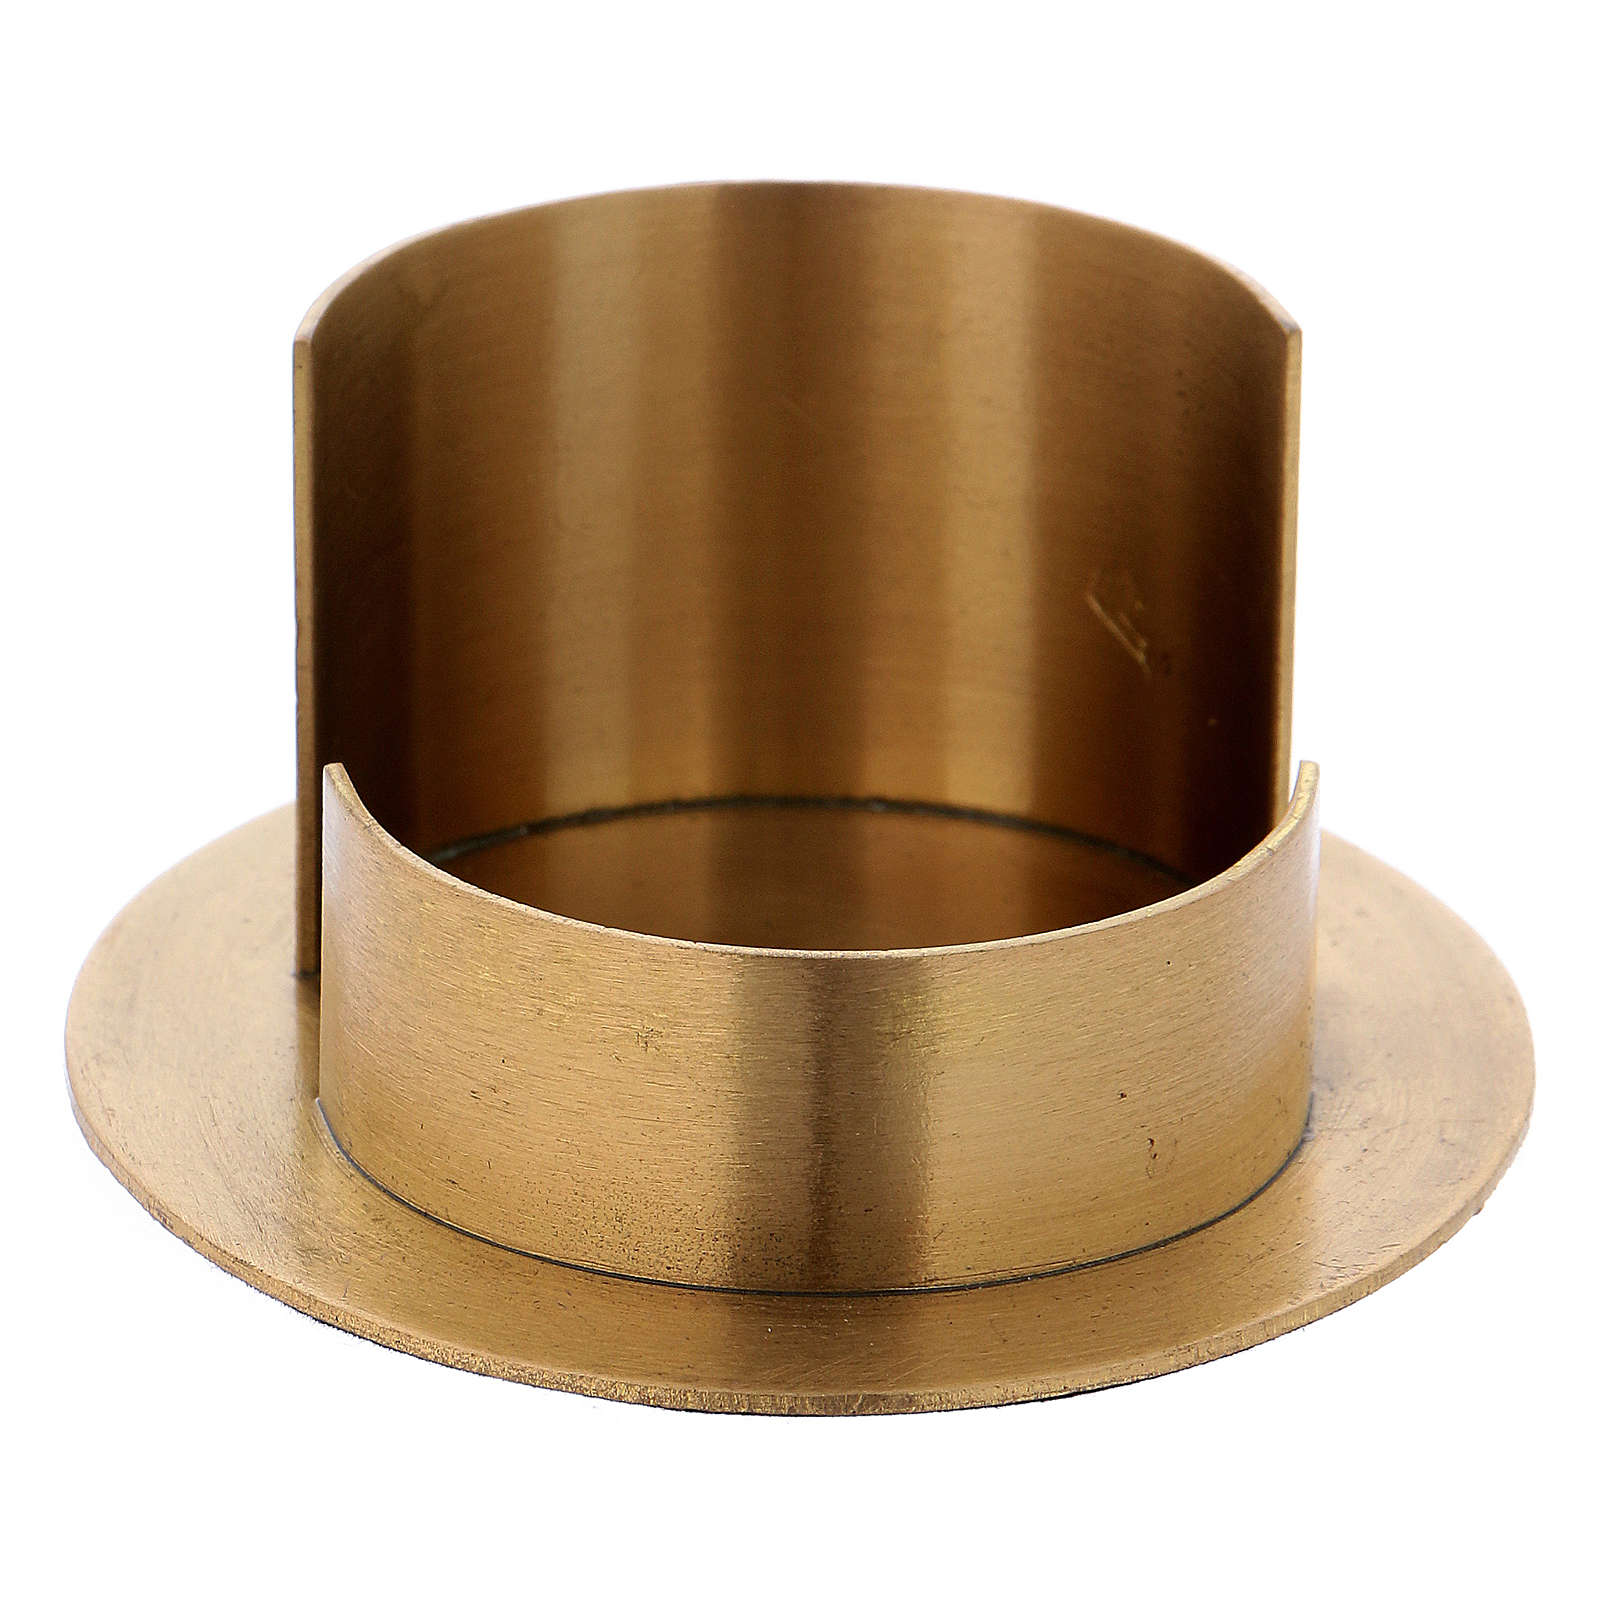 Portacandele linee moderne ottone dorato satinato 4